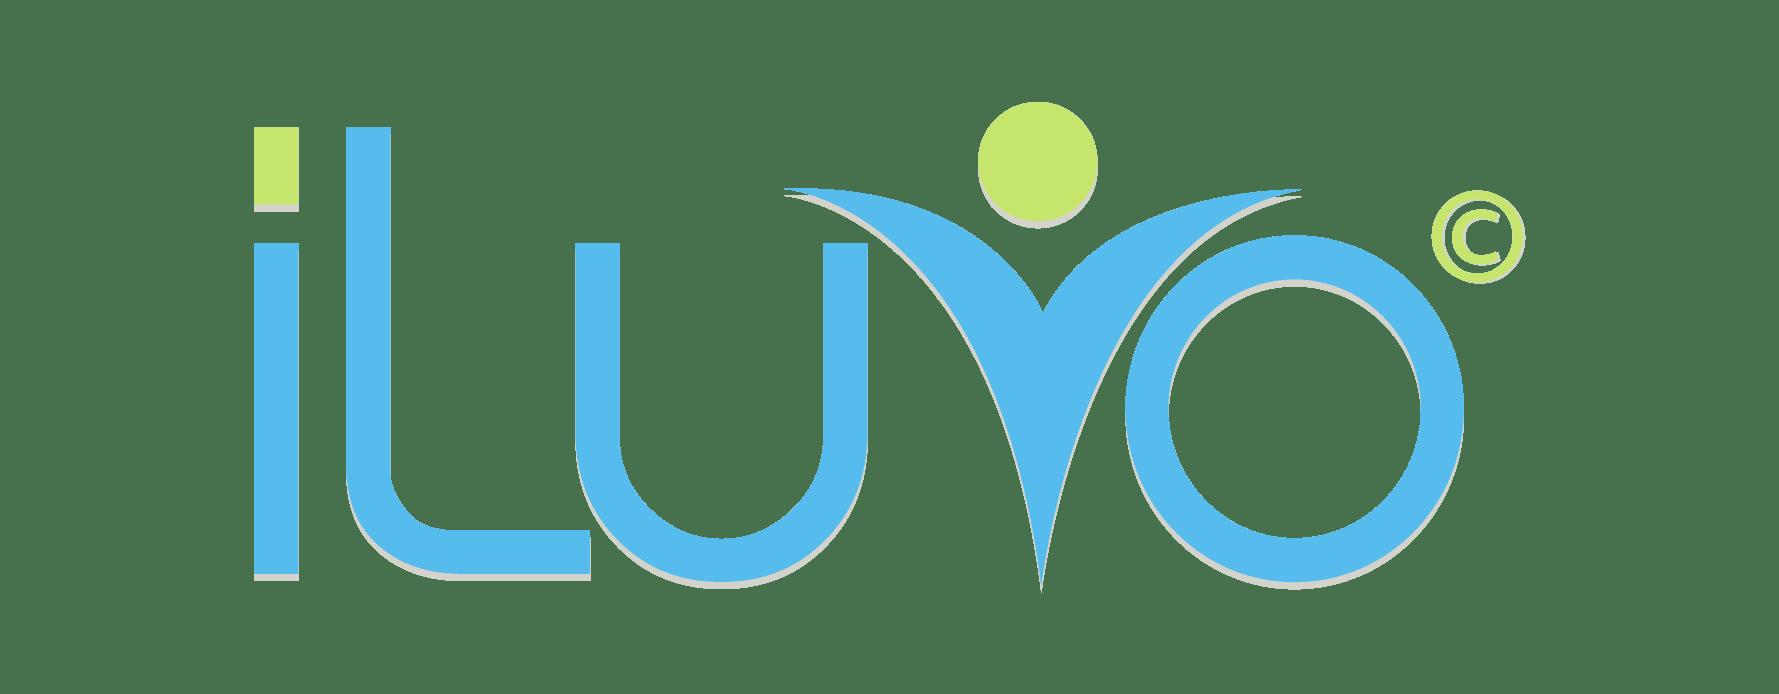 iLuvo Full Logo